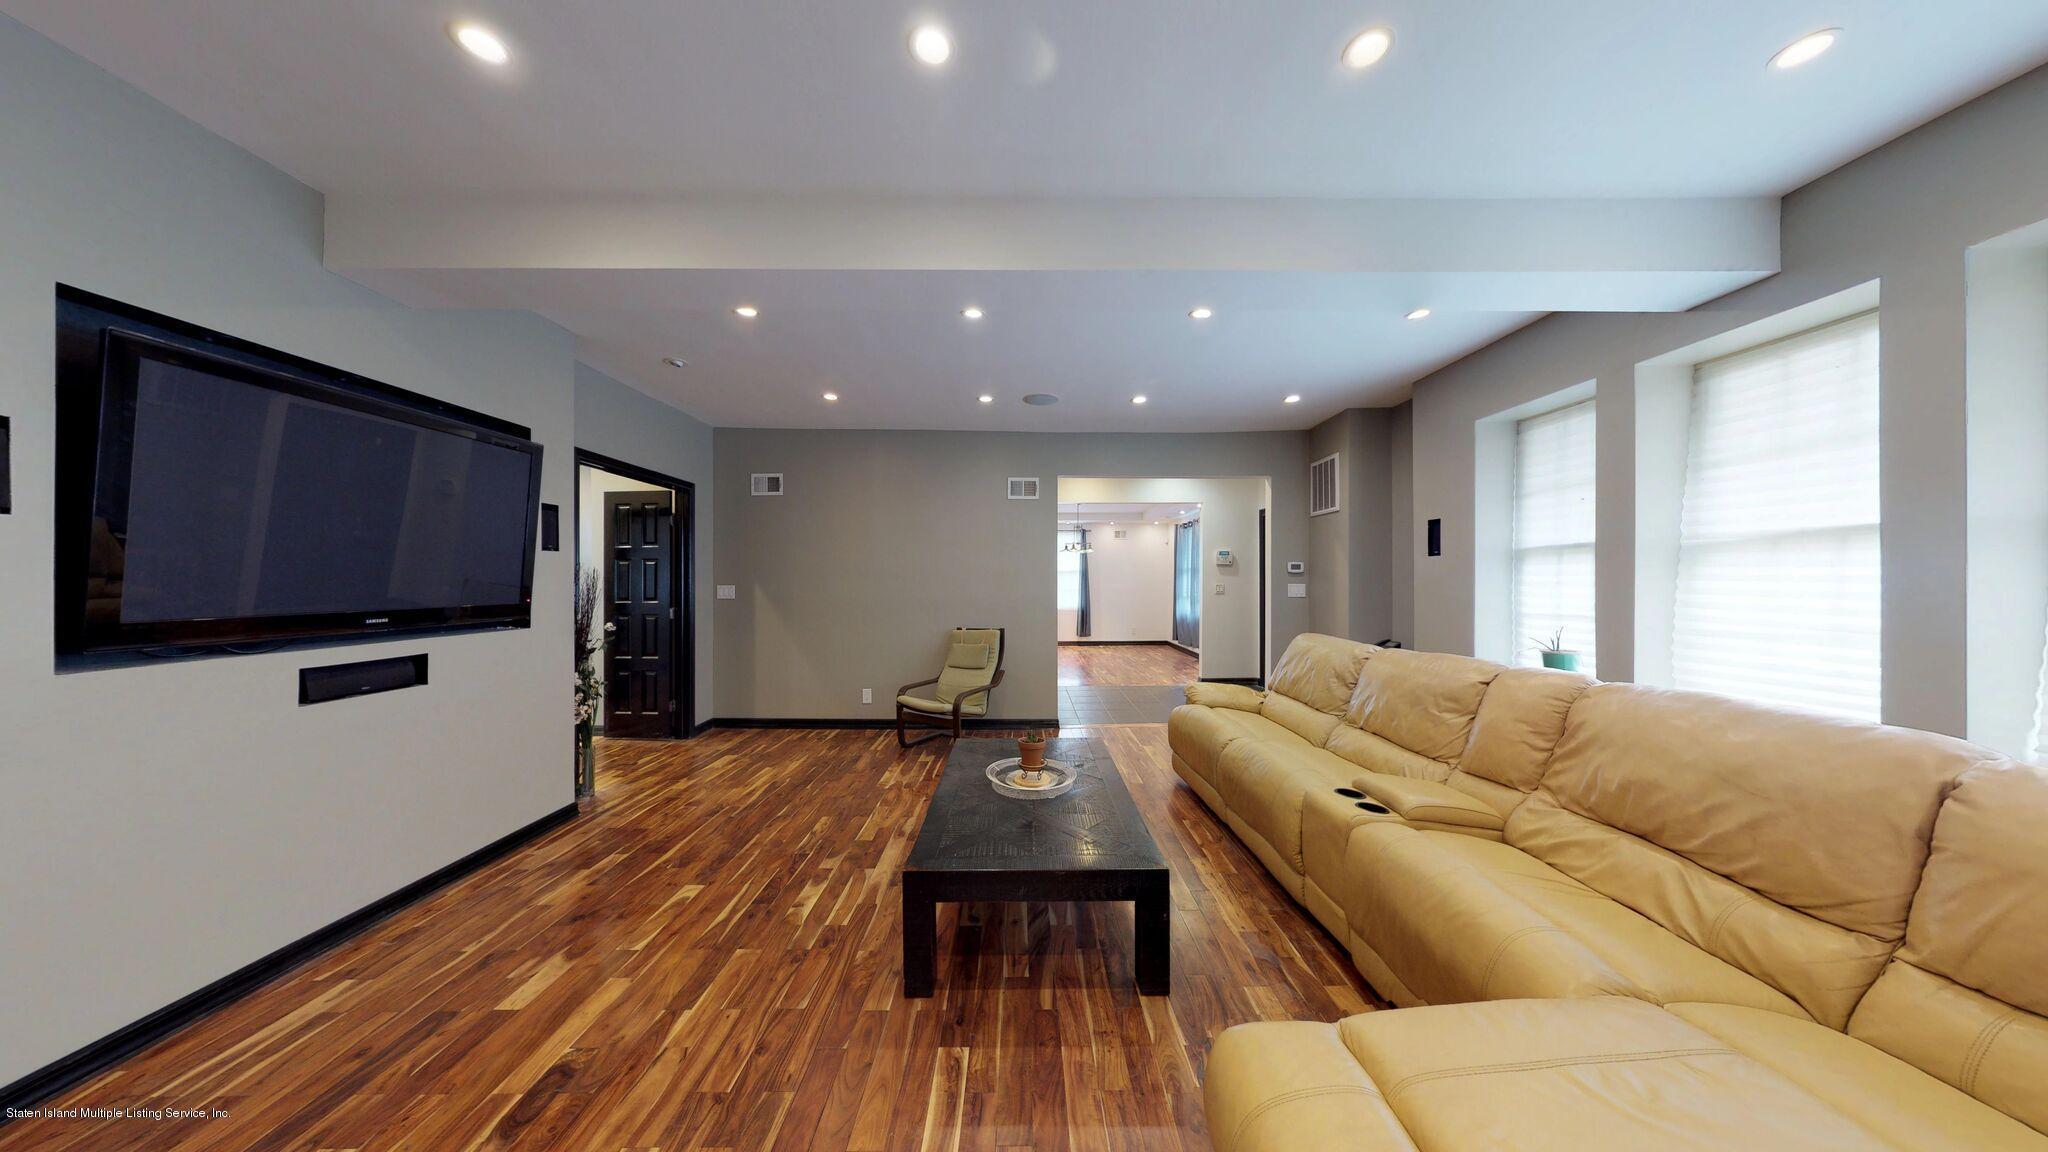 Single Family - Detached 128 Pelton Avenue  Staten Island, NY 10310, MLS-1124023-3